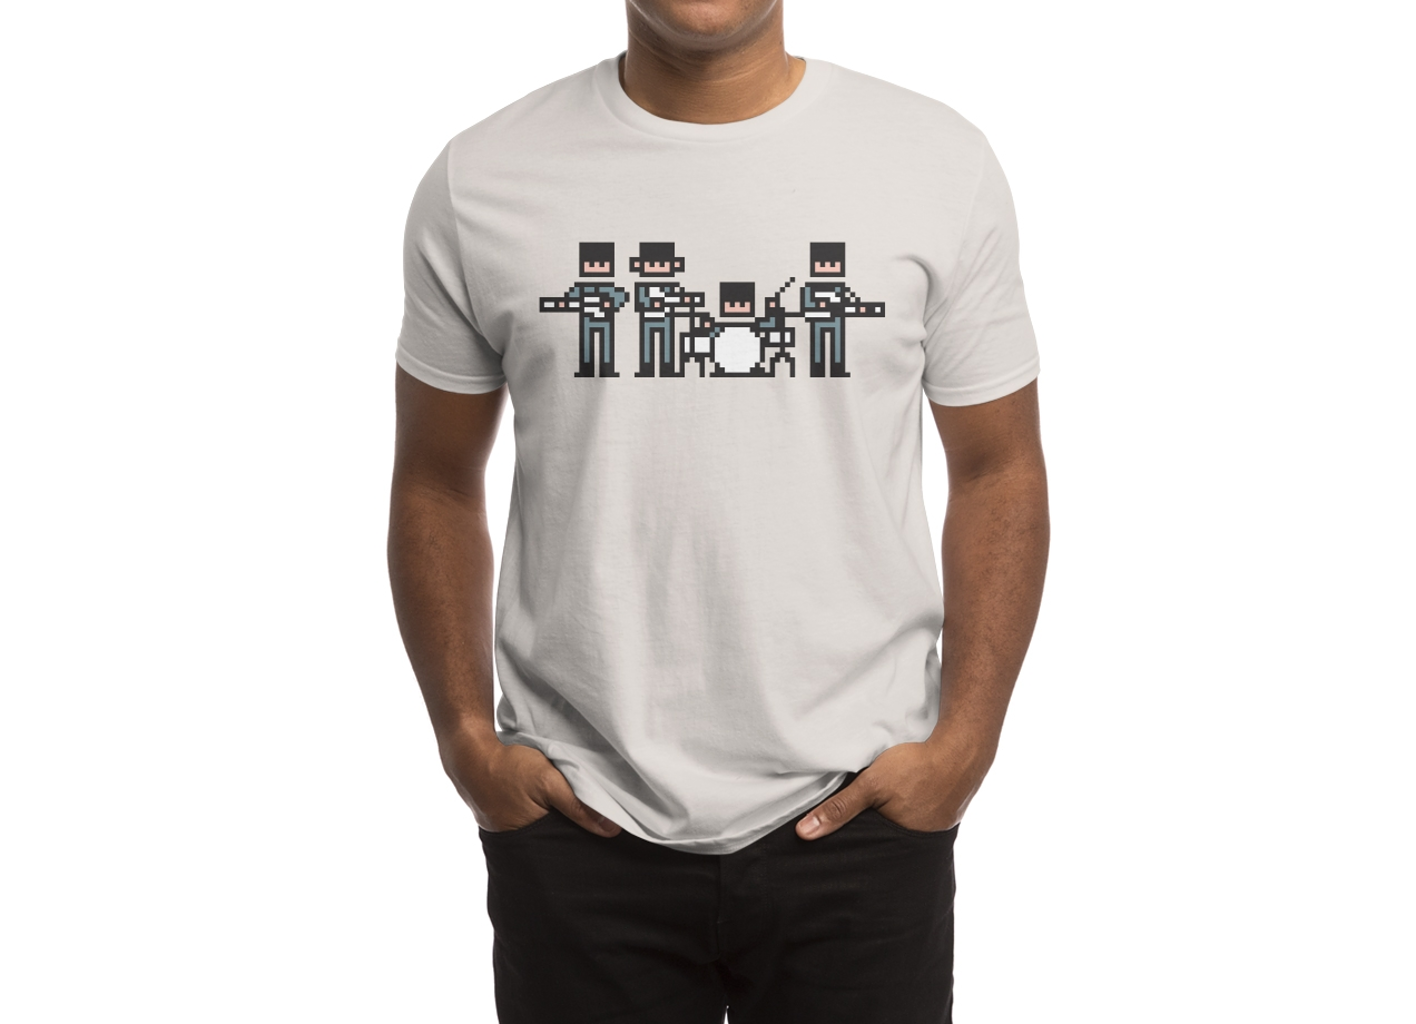 Threadless: The Bitles